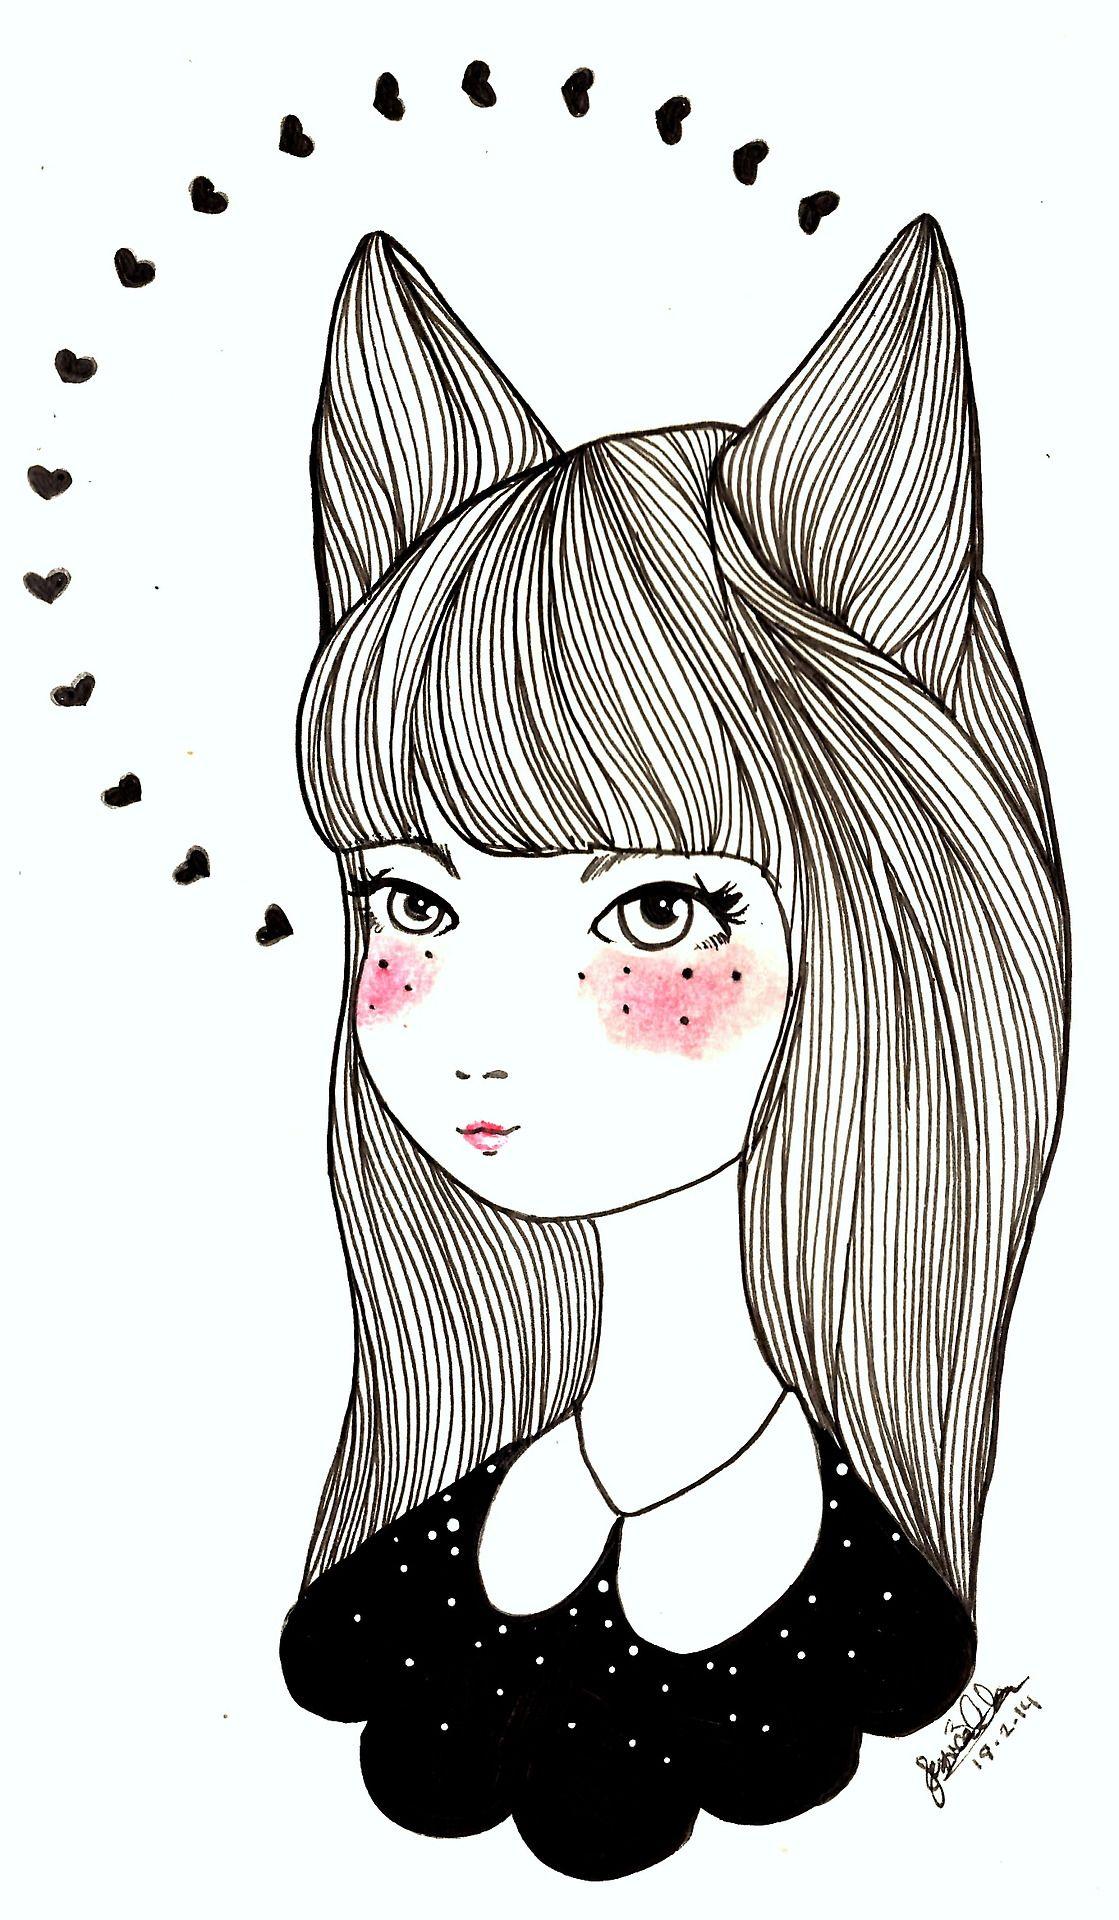 Cat Illustration Tumblr tumblr_n1bcut8y...